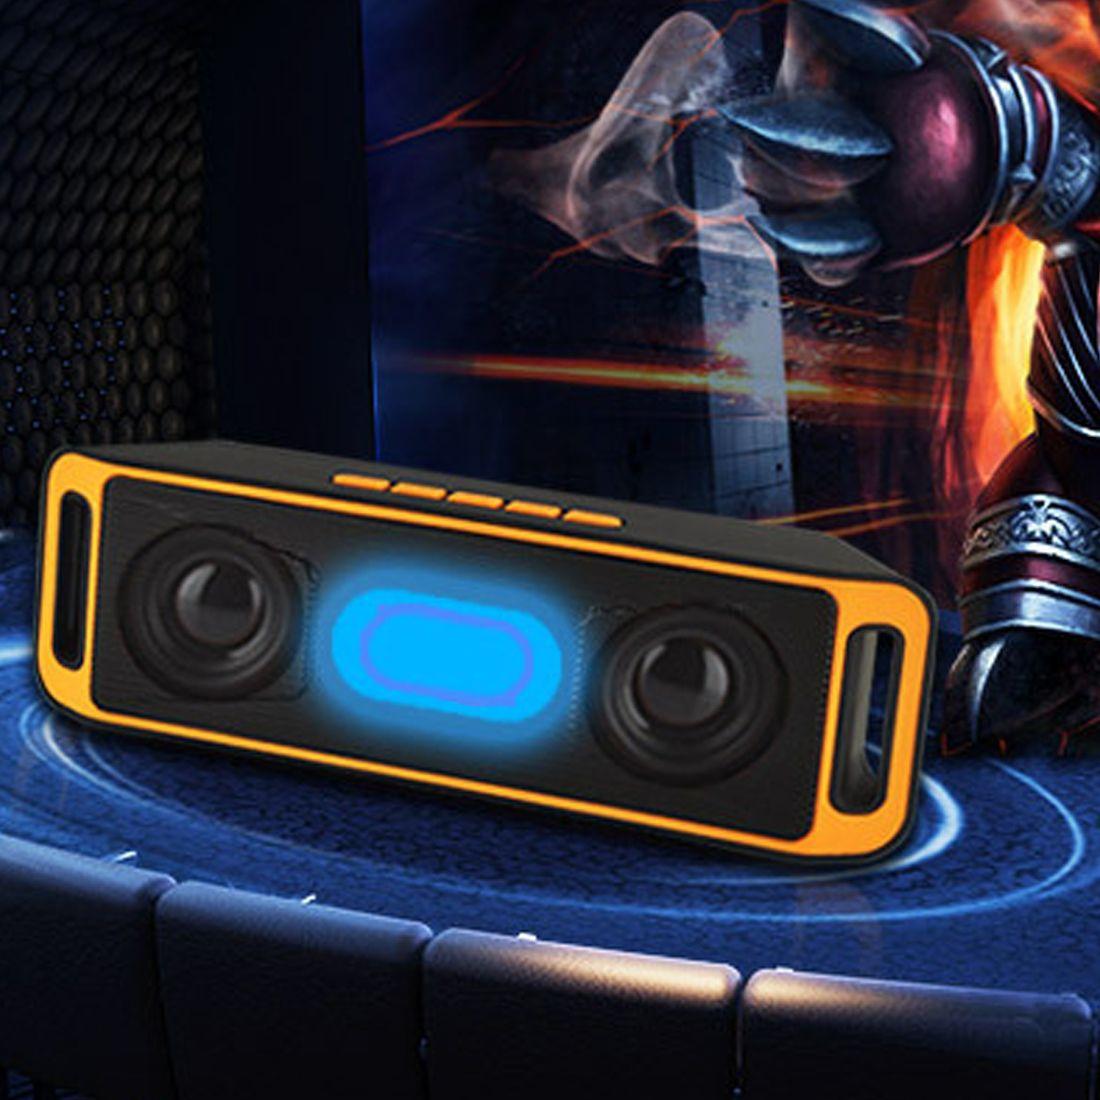 SC208 Süper Bas Ses Hoparlör Bluetooth Portatil Stereo Senza Fili Subwoofer TF USB FM Radyolojik bağlantı başına telefono forhuawei